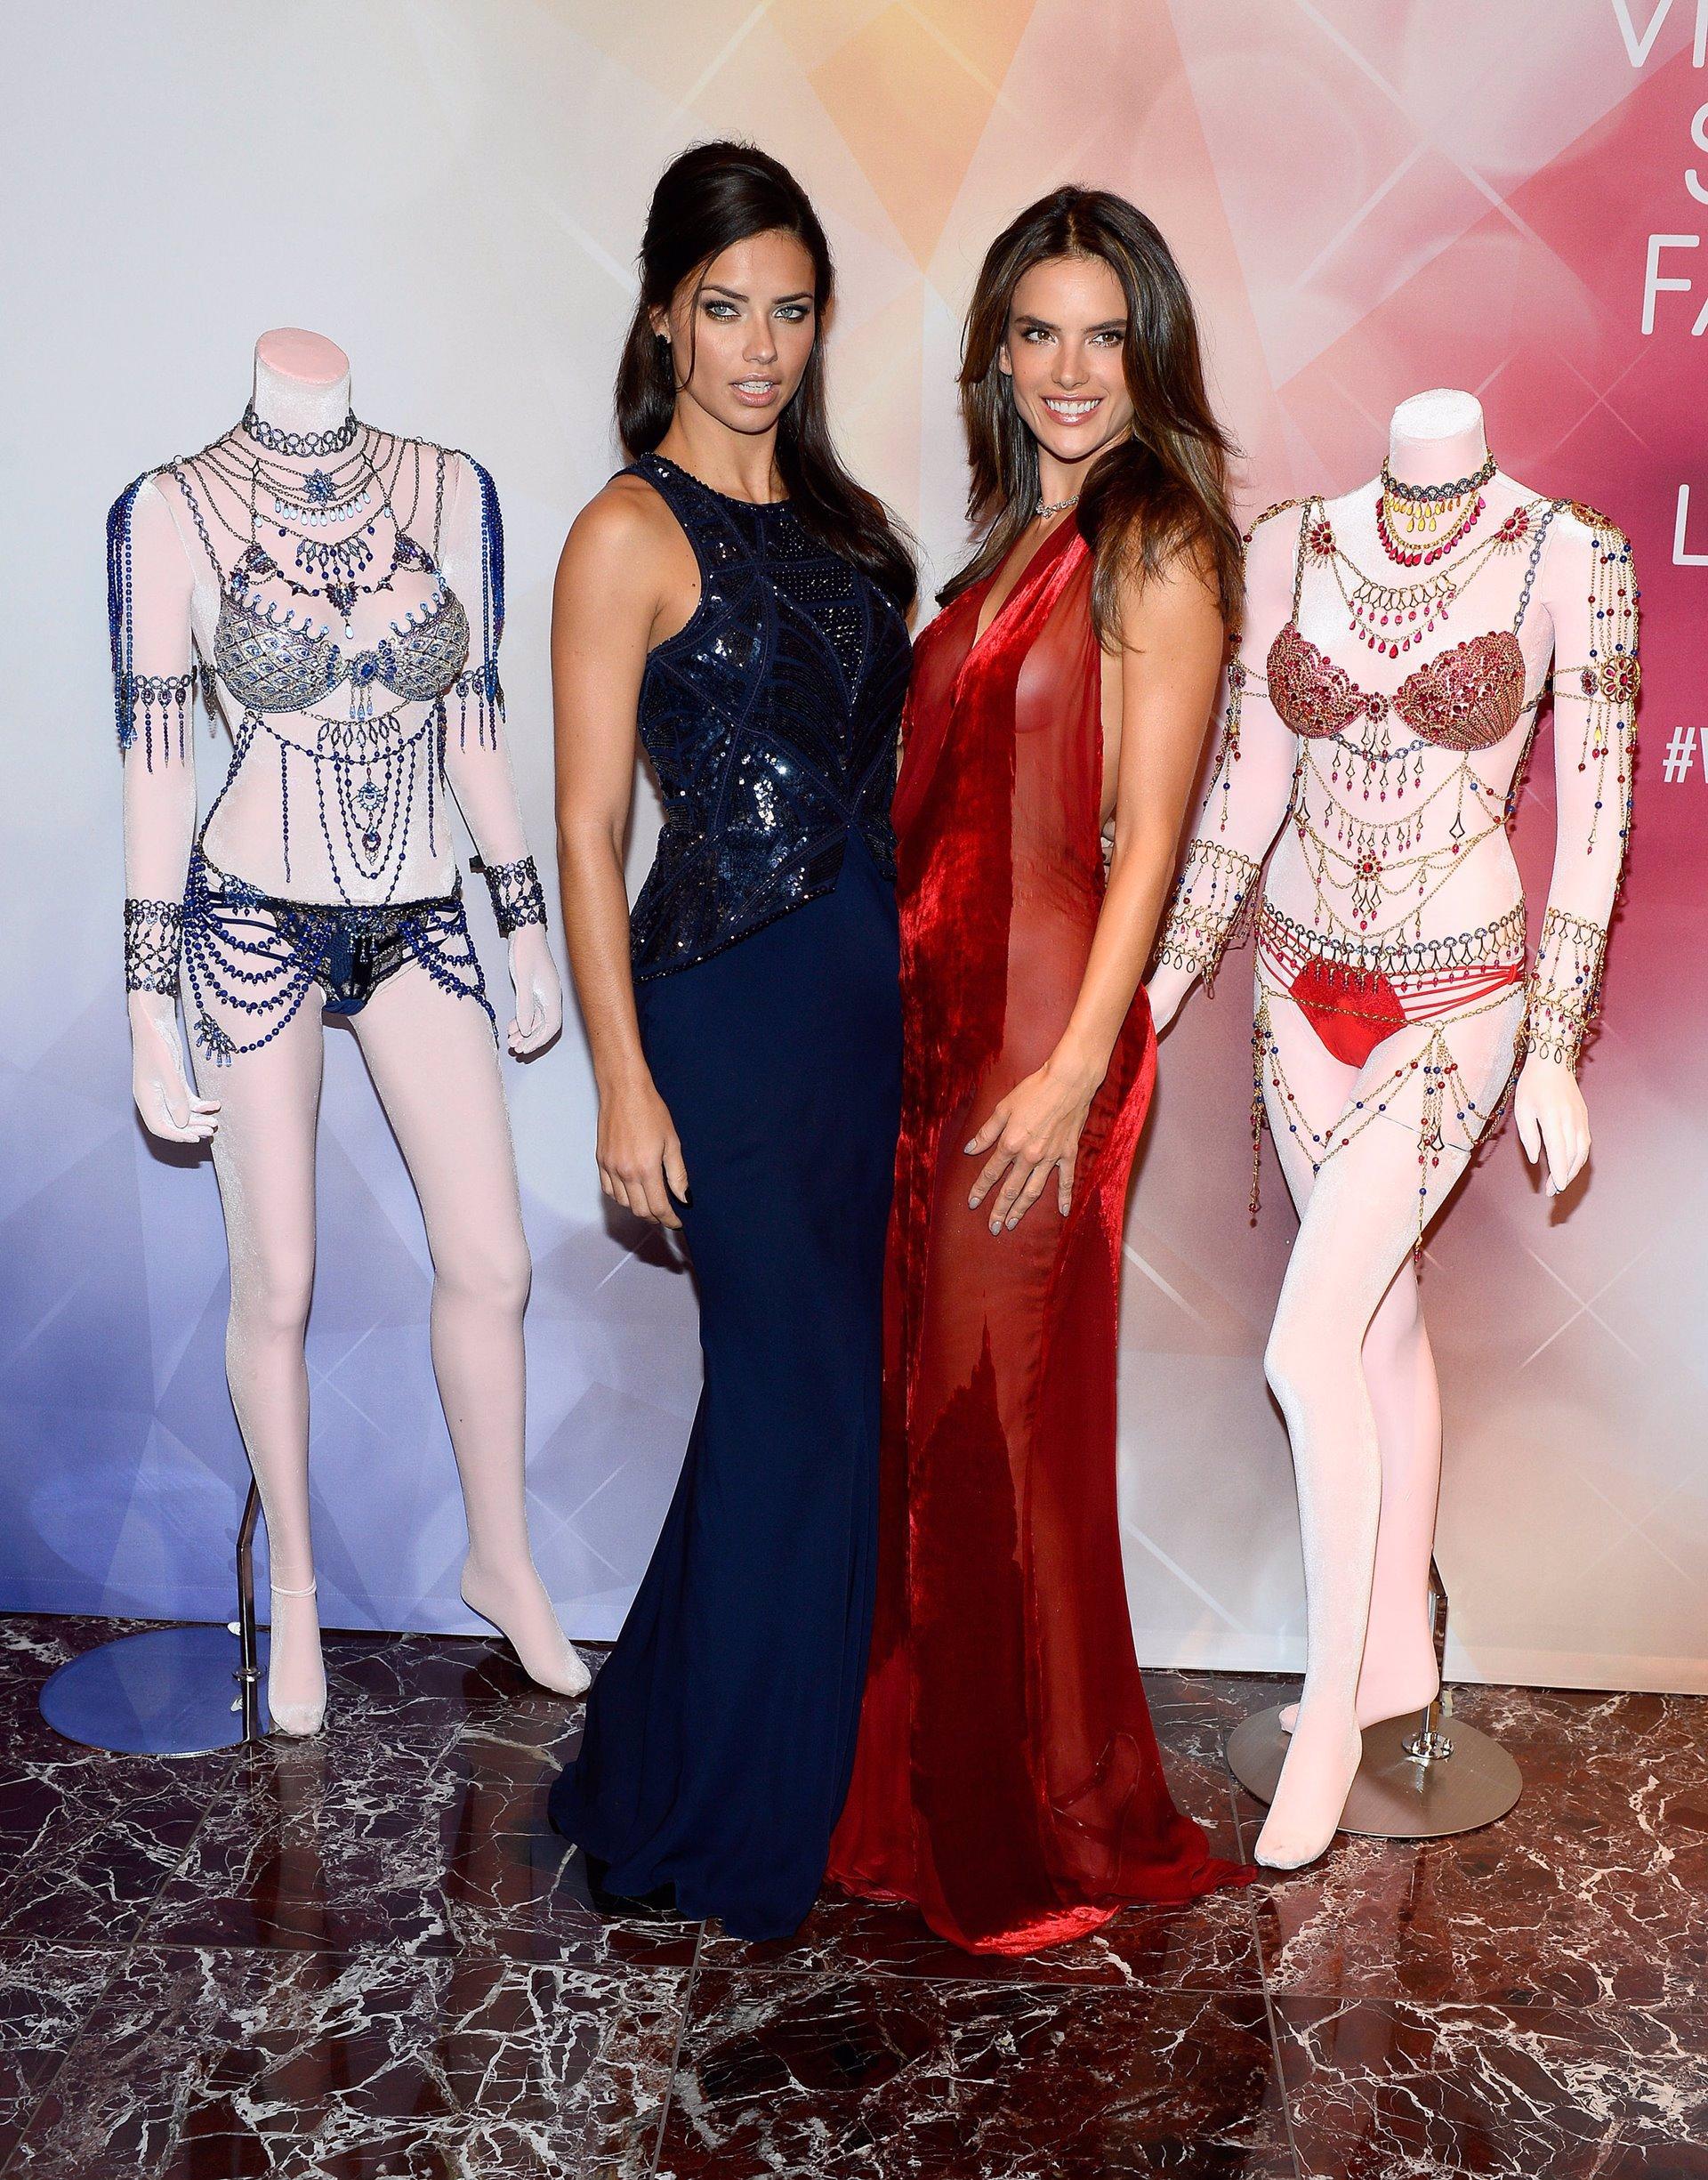 Adriana Lima y Alessandra Ambrosio